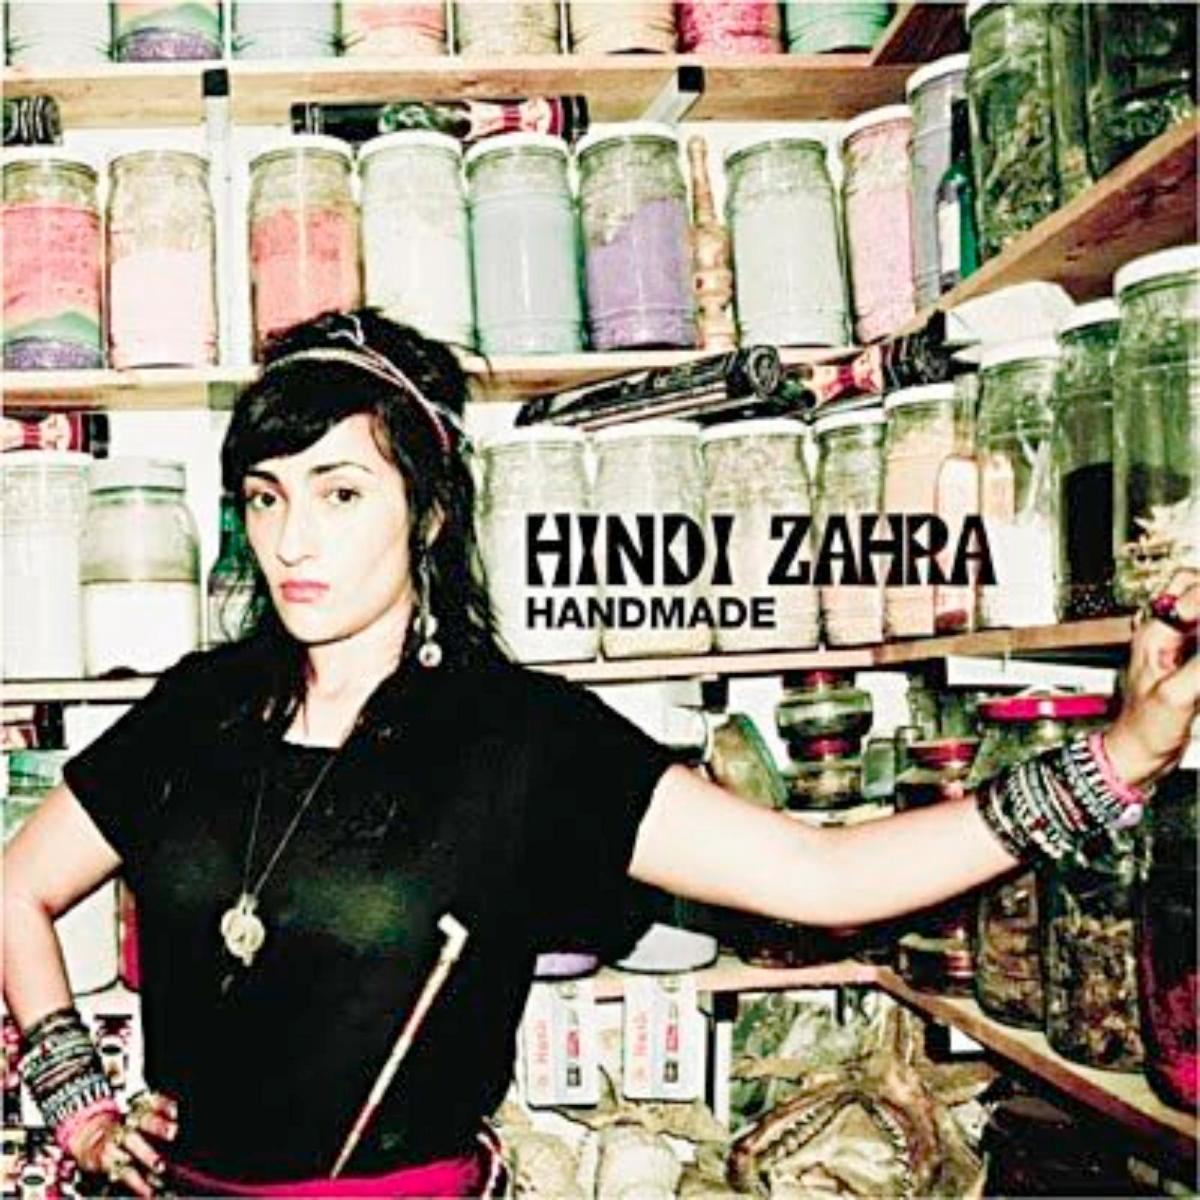 Hindi Zahra《Handmade》:非洲藍調爵士與法國香頌的神秘結合